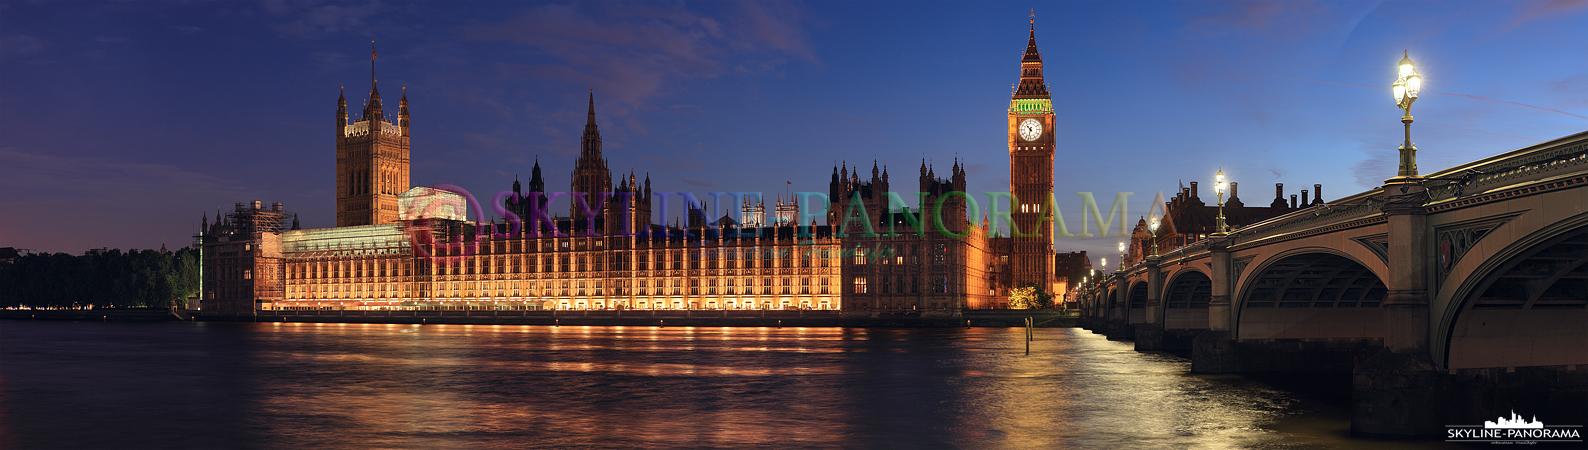 London Big Ben - Panorama